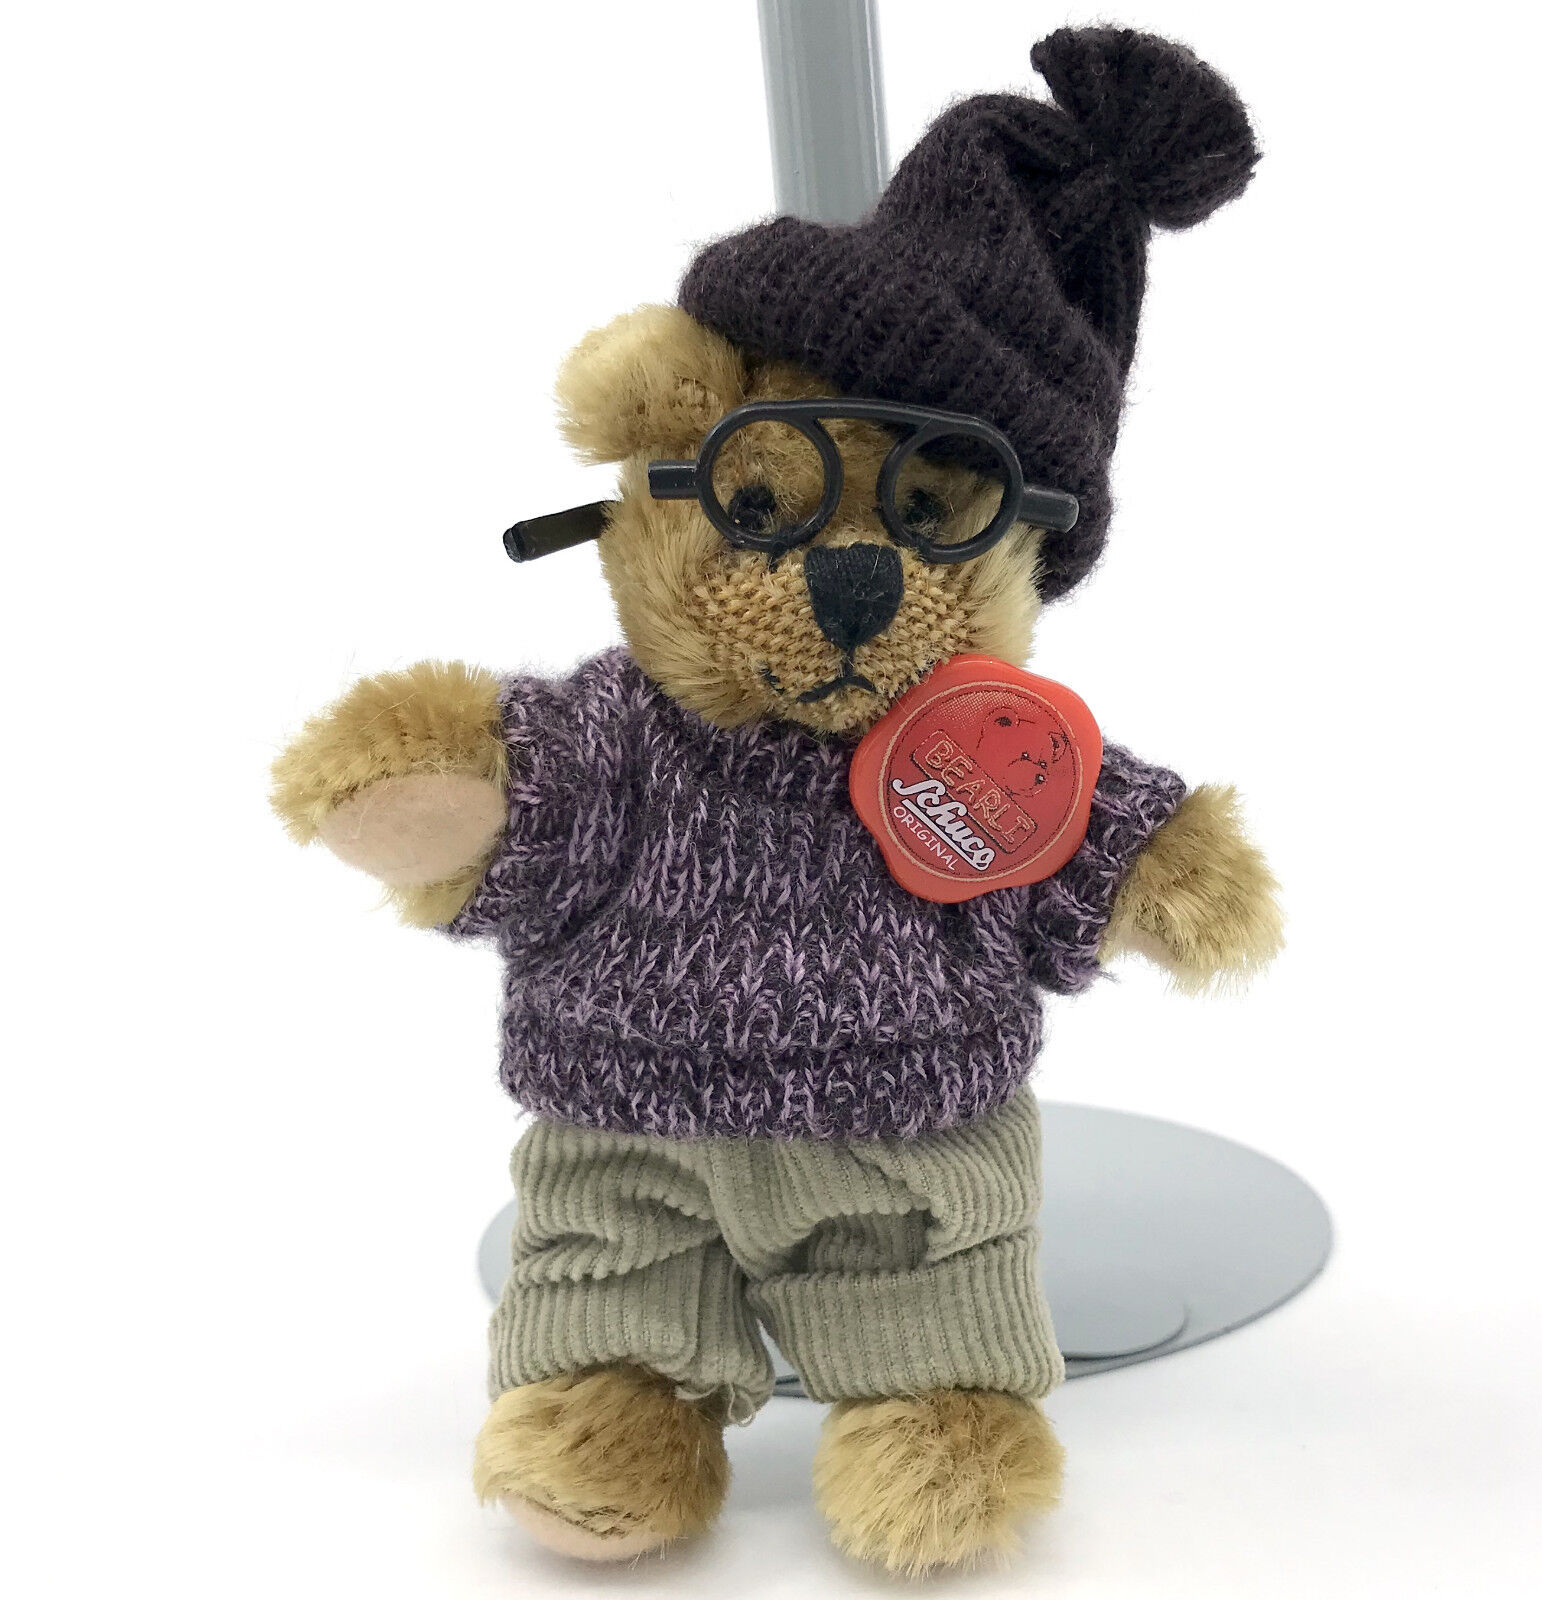 Schuco Plush Bearli Opa Grandpa II Miniature 12cm 5in Teddy Bear ID 2003 Sweater